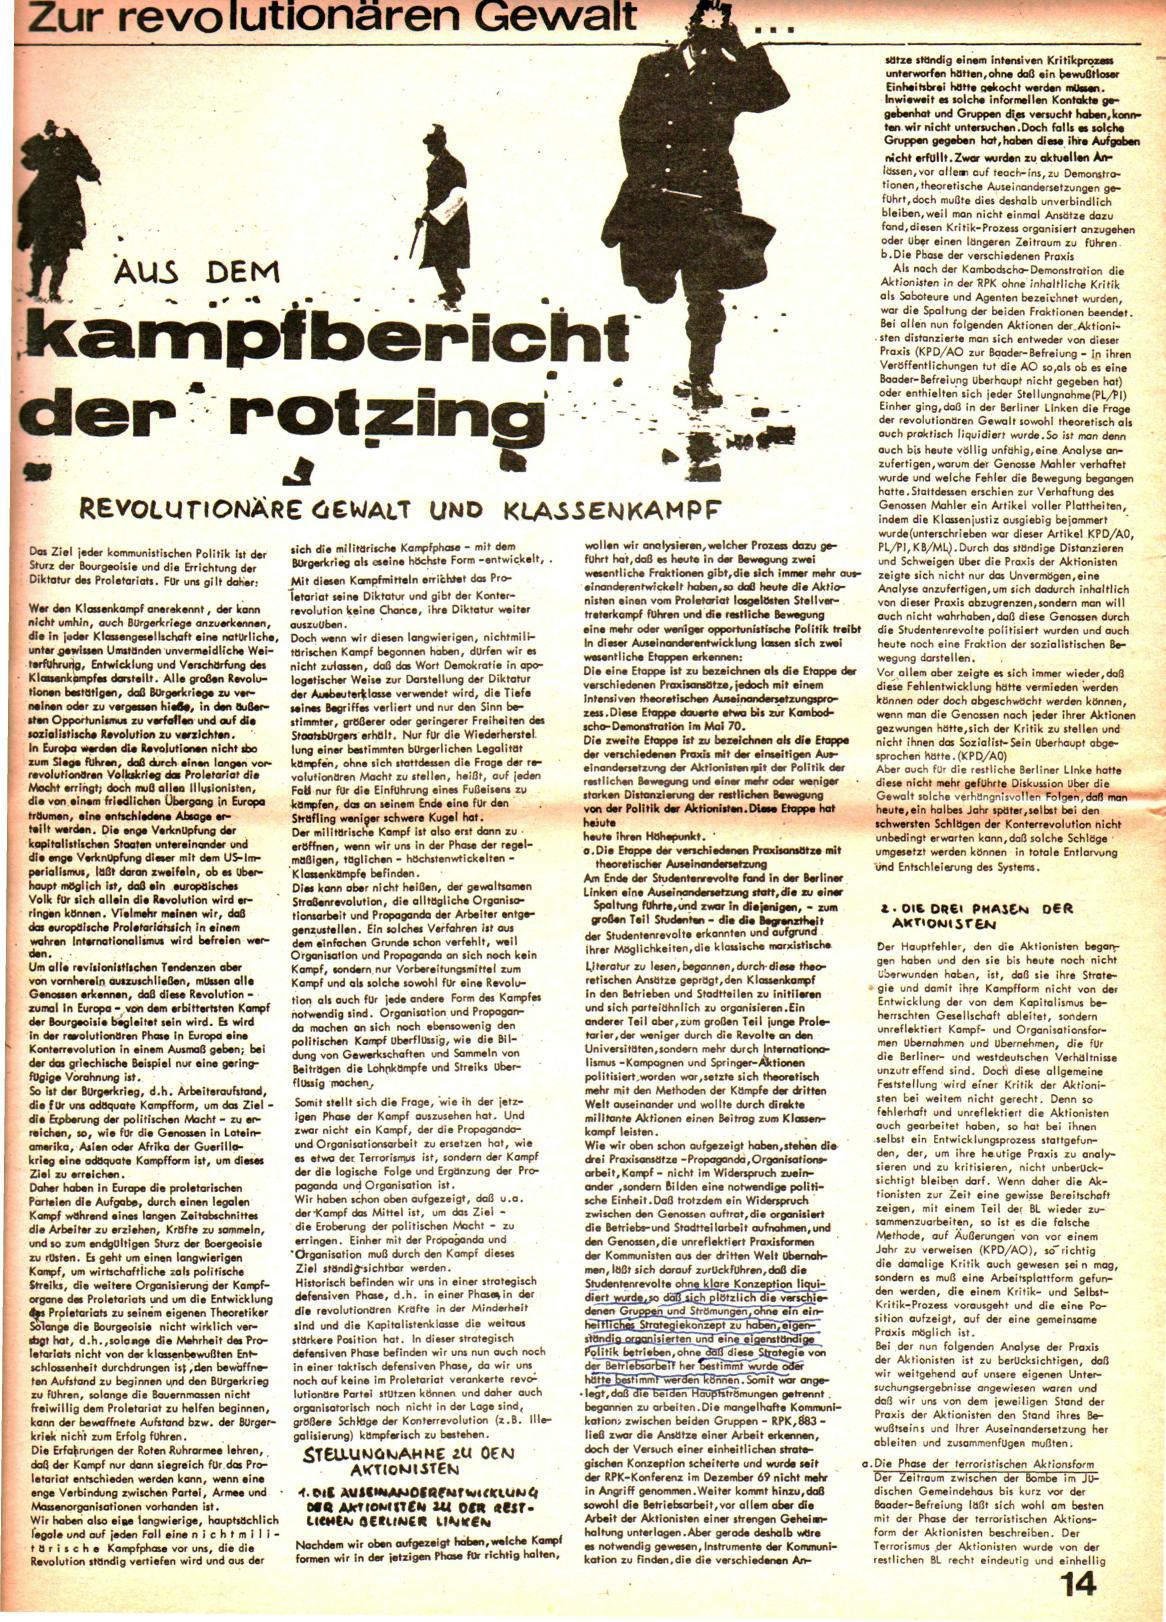 Berlin_Hochschulkampf_1971_09_14